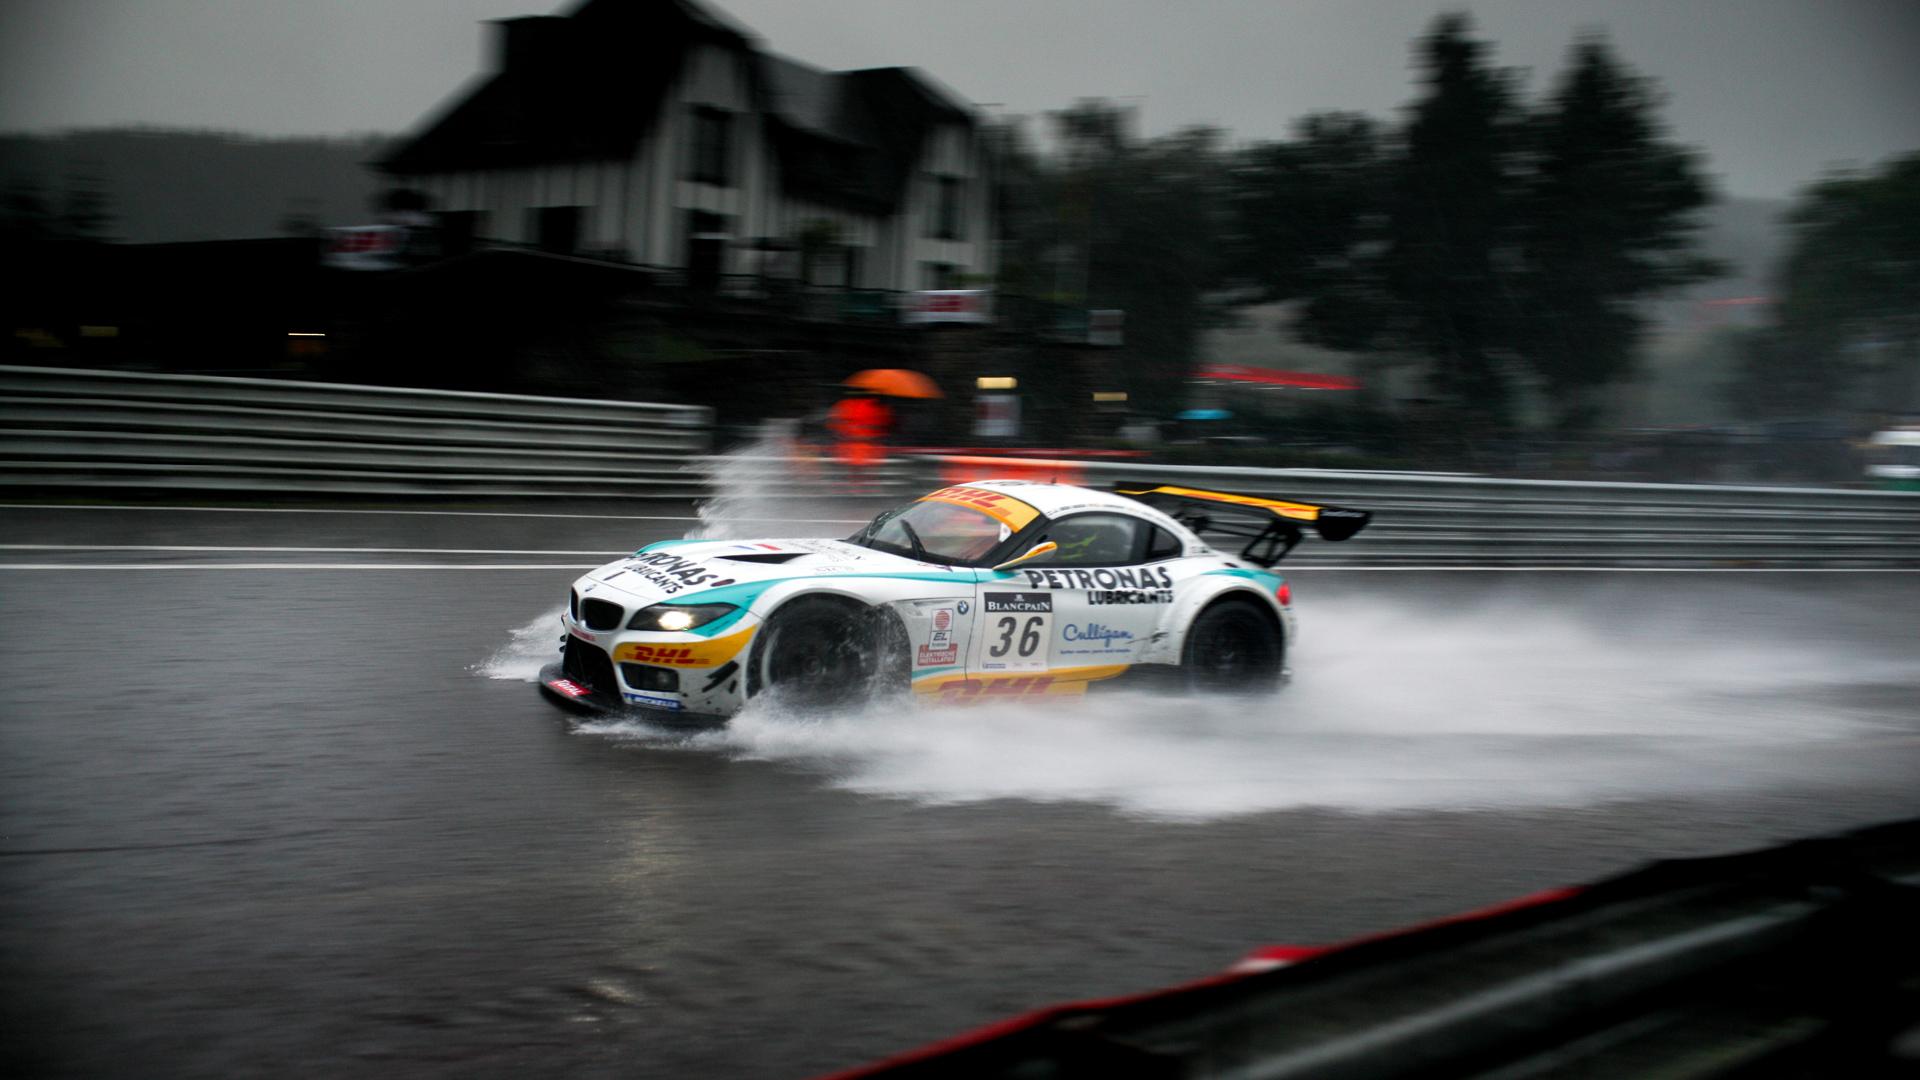 BMW Rain Race Wallpaper HD Car Wallpapers 1920x1080